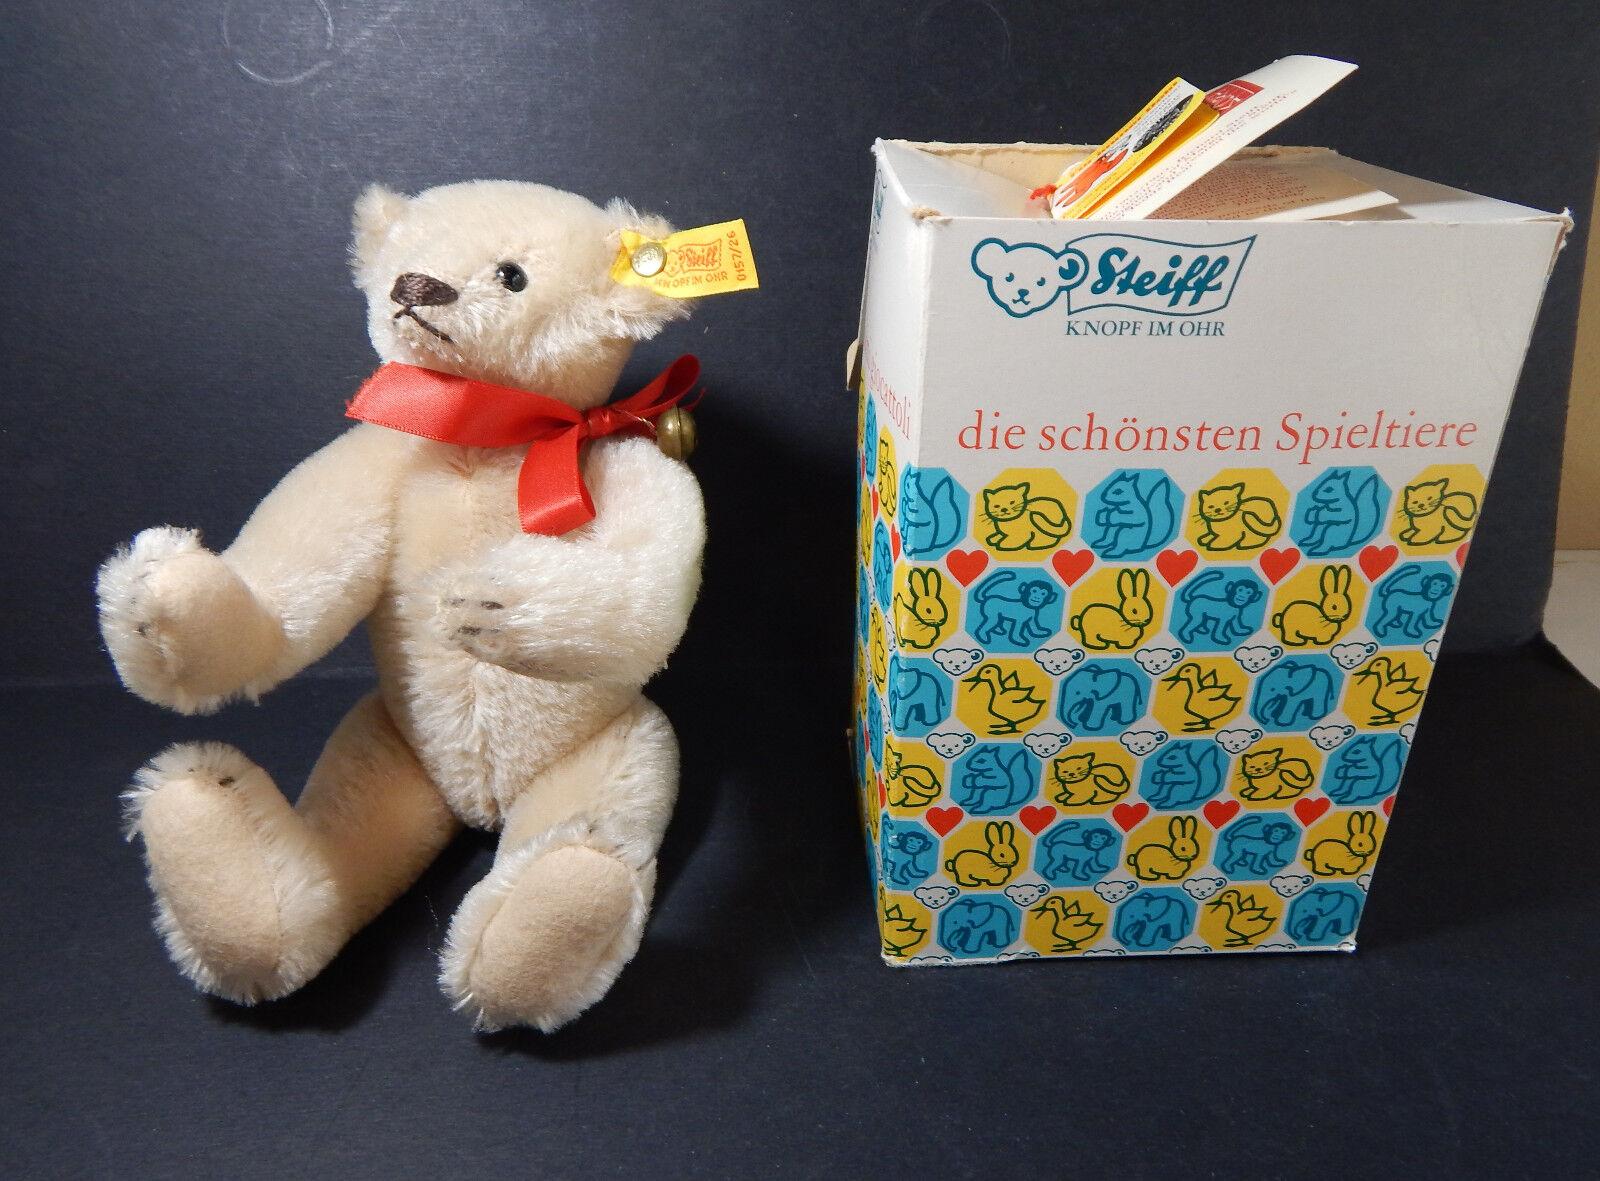 STEIFF 1904 TEDDY BEAR REPLICA  jointed EAR BUTTON   0157/26 Original Box & Tags